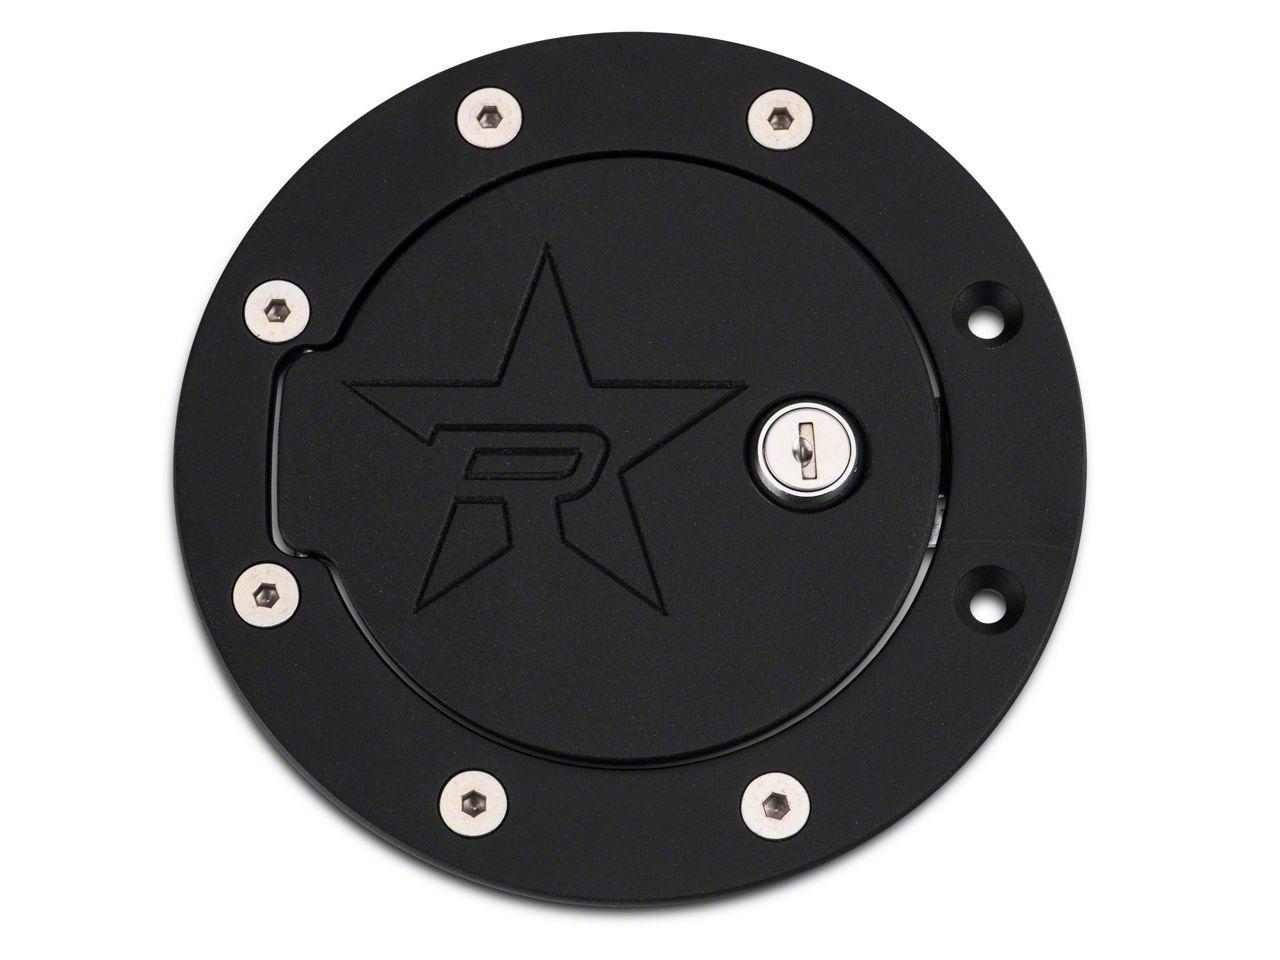 RBP RX-2 Locking Fuel Door - Black (97-03 F-150 Styleside)